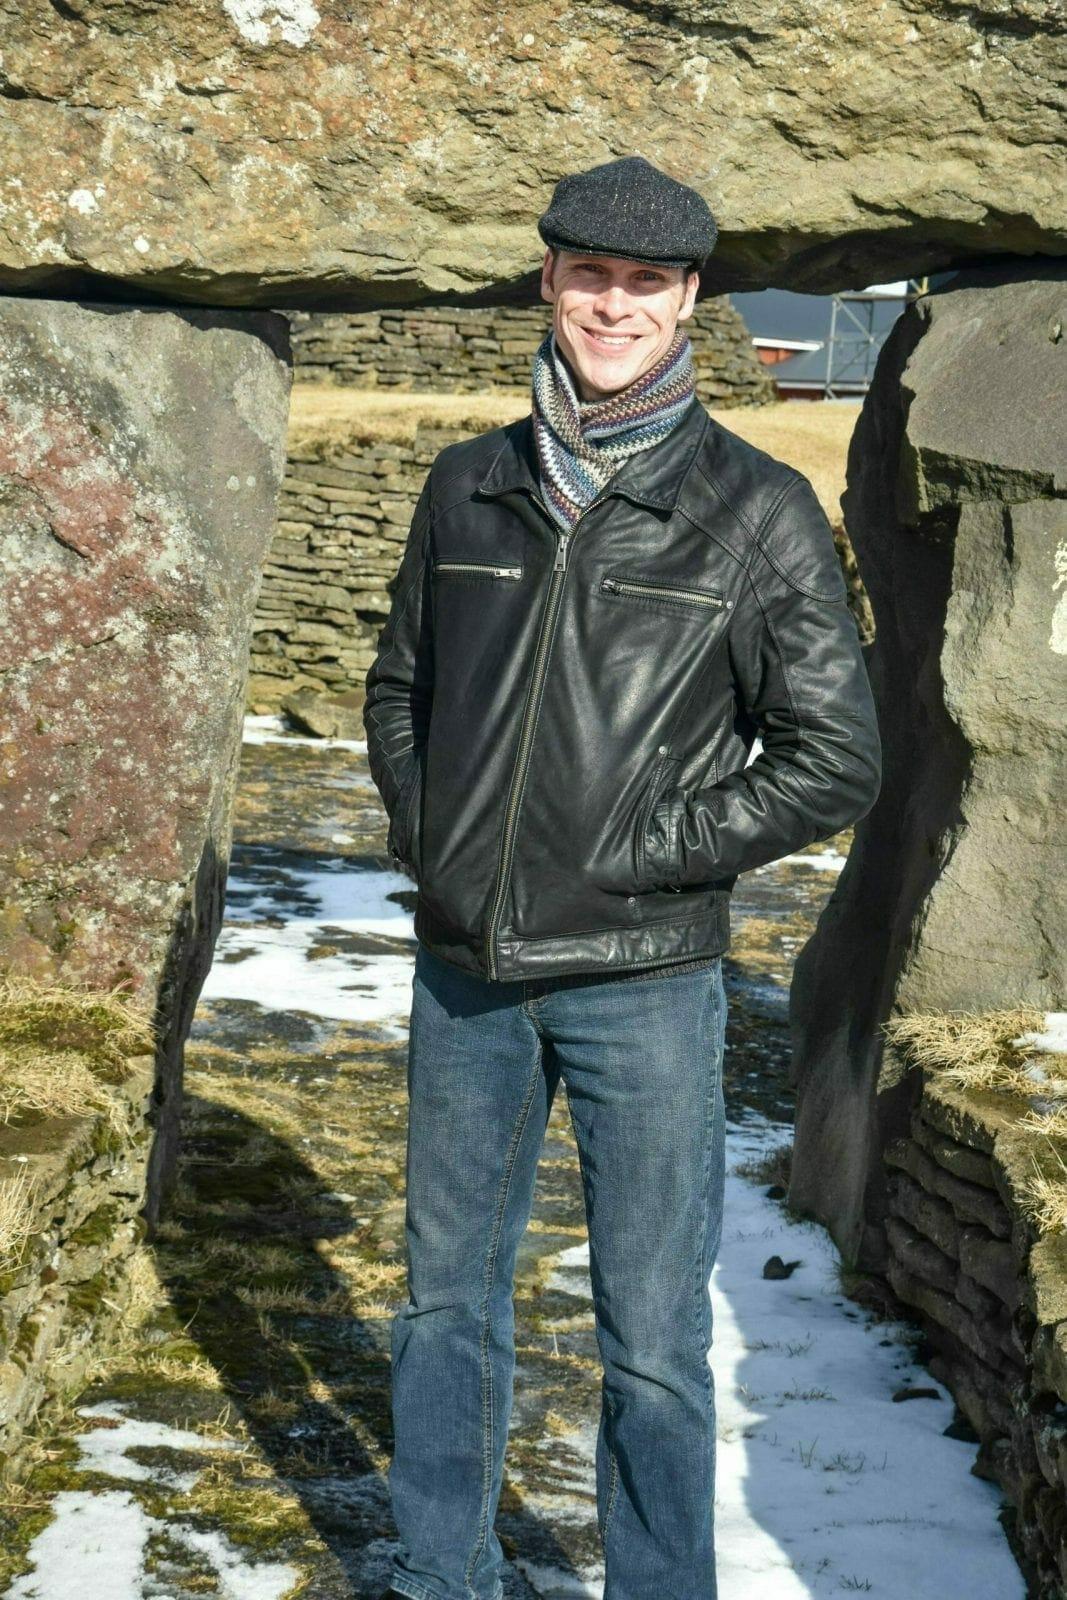 Ryan in Normandy